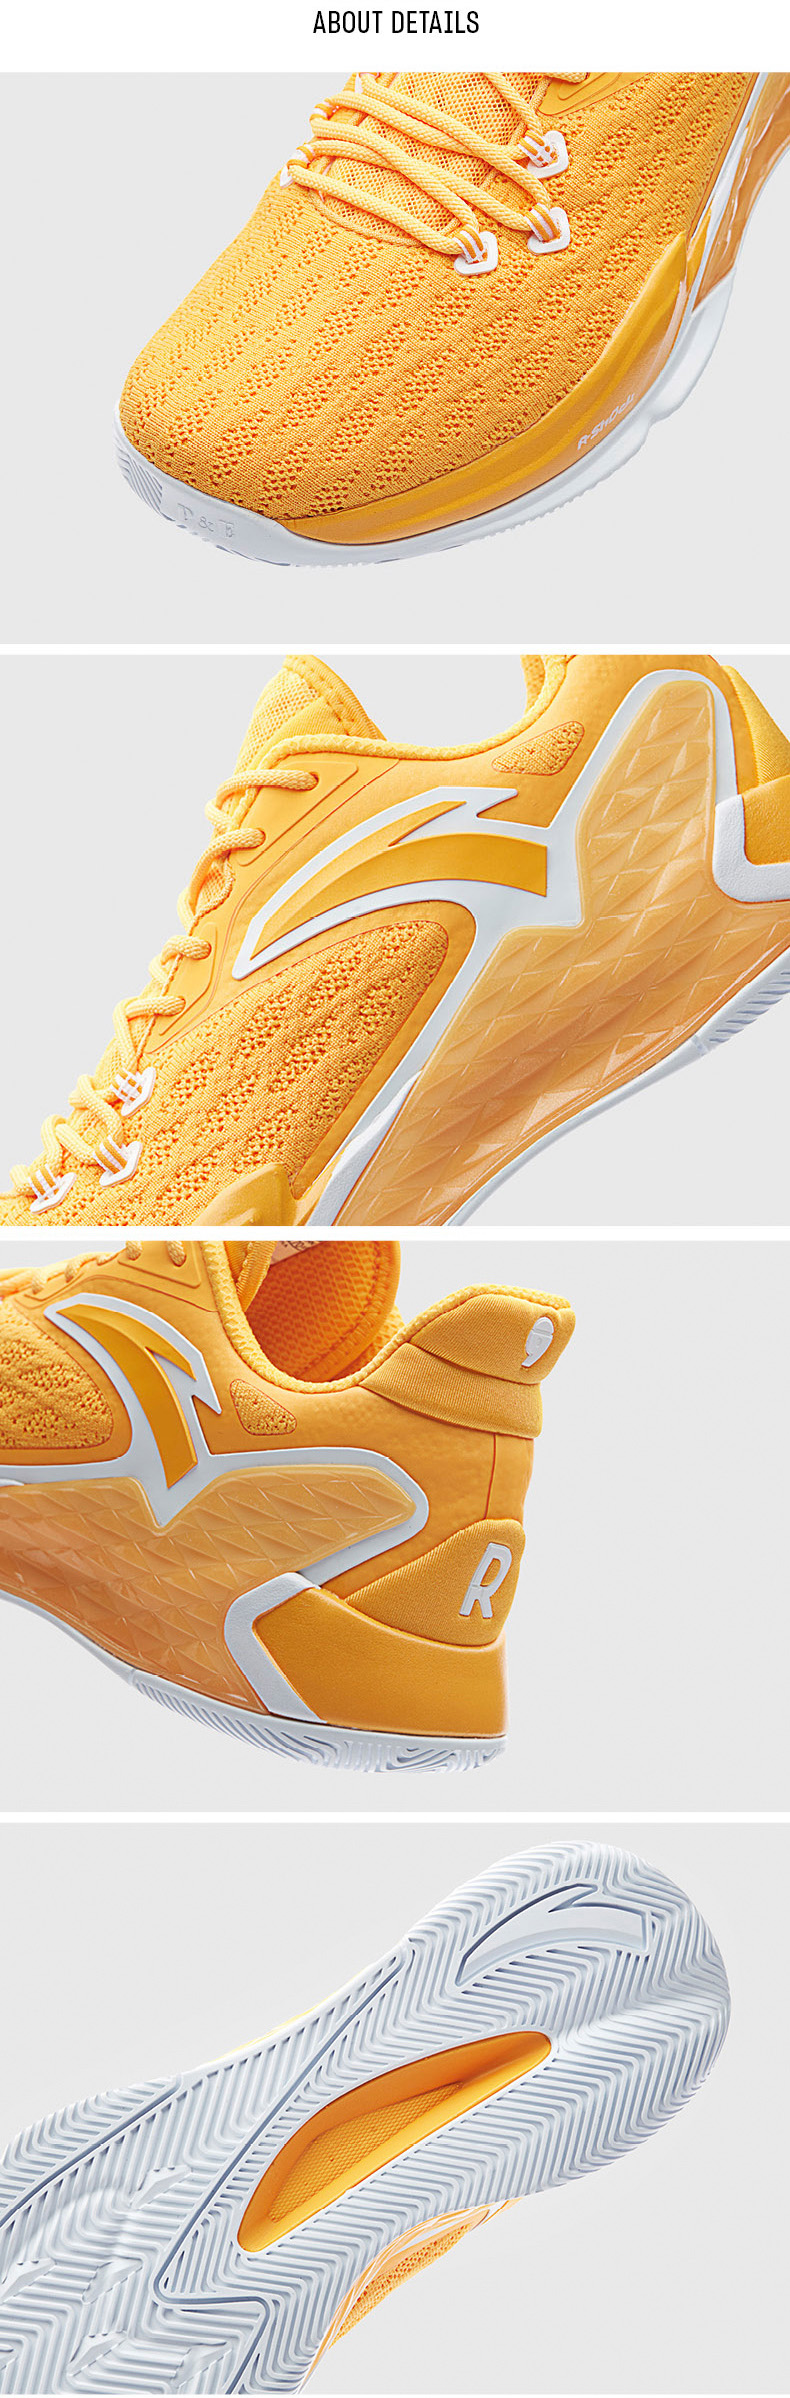 2019 Summer Anta Rajon Rondo RR5 Lakers NBA Basketball Shoes - White/Purple/Yellow